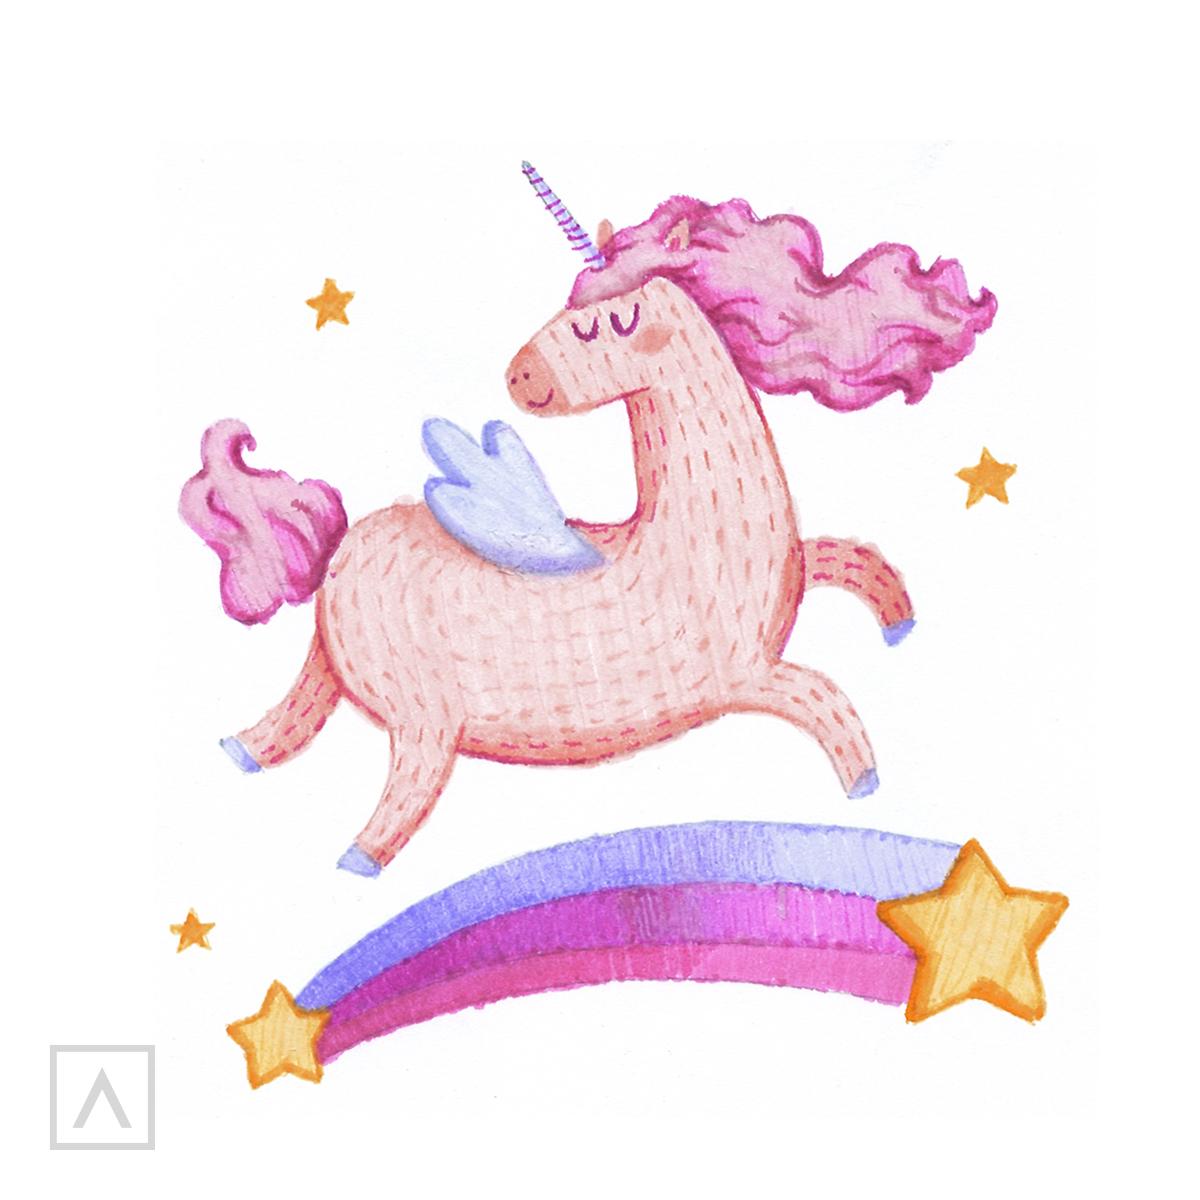 How to Draw a Unicorn - Step 10